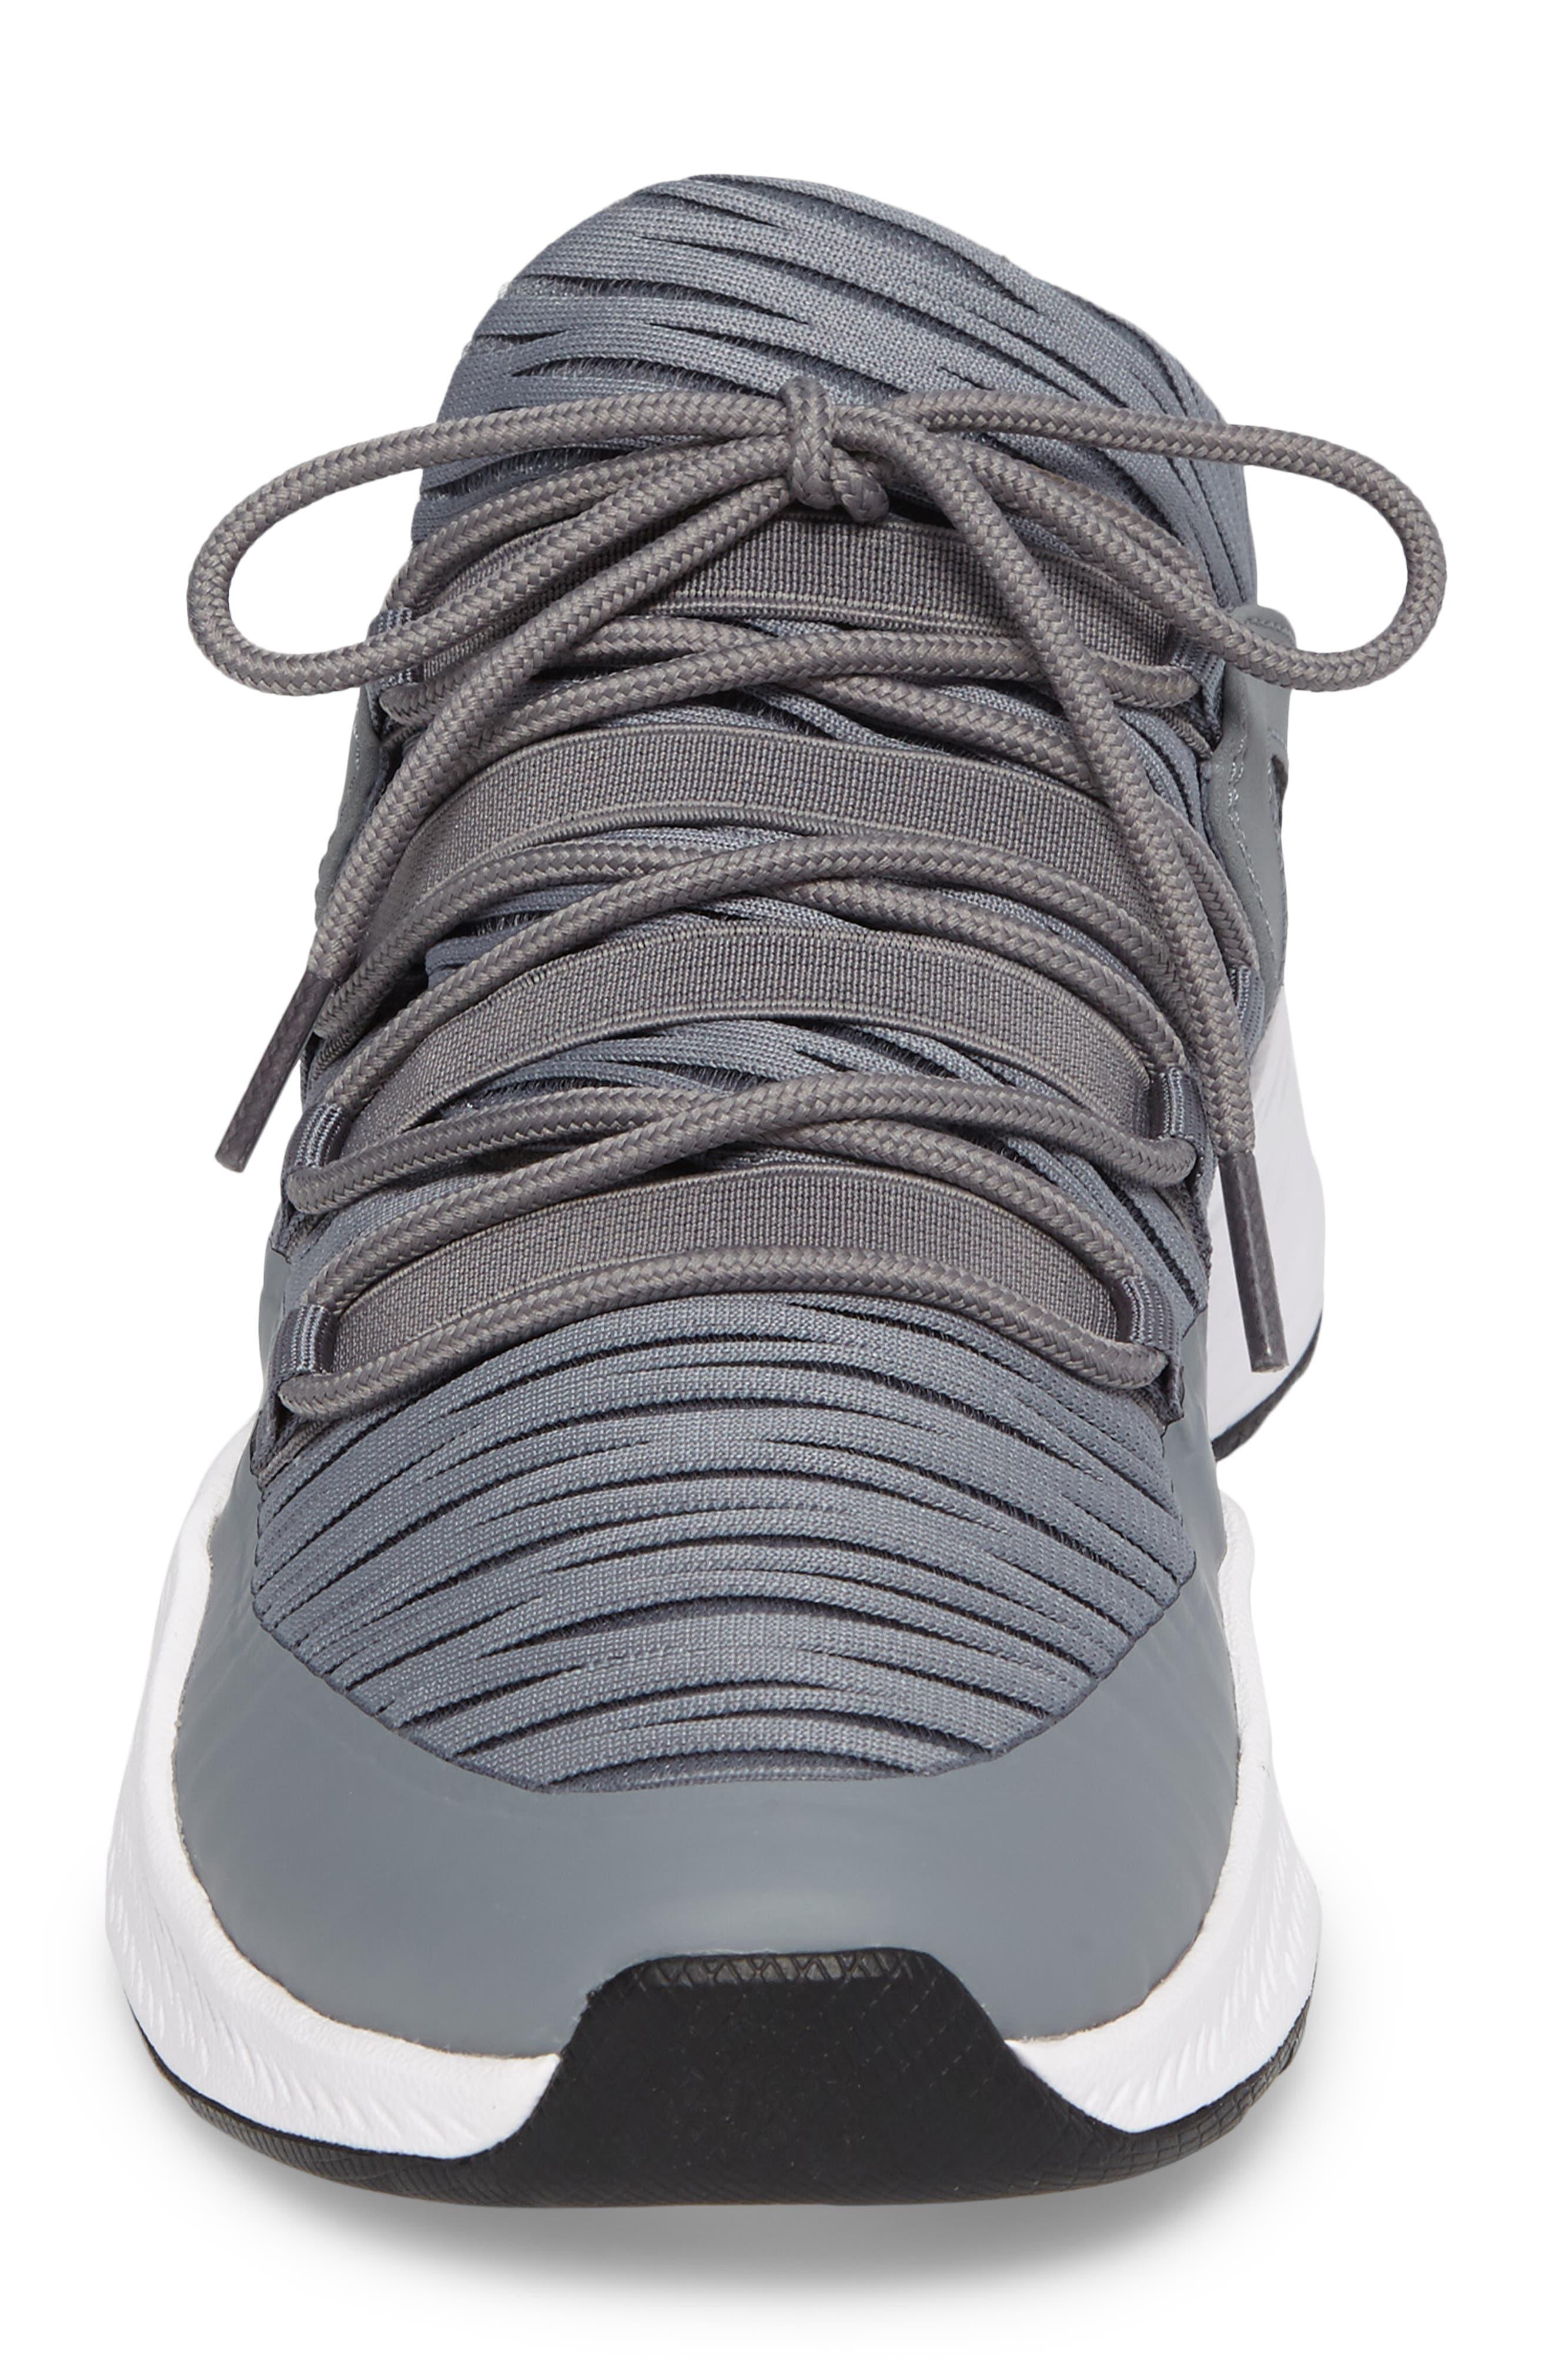 Jordan Formula 23 Low Sneaker,                             Alternate thumbnail 4, color,                             Cool Grey/ White/ Black